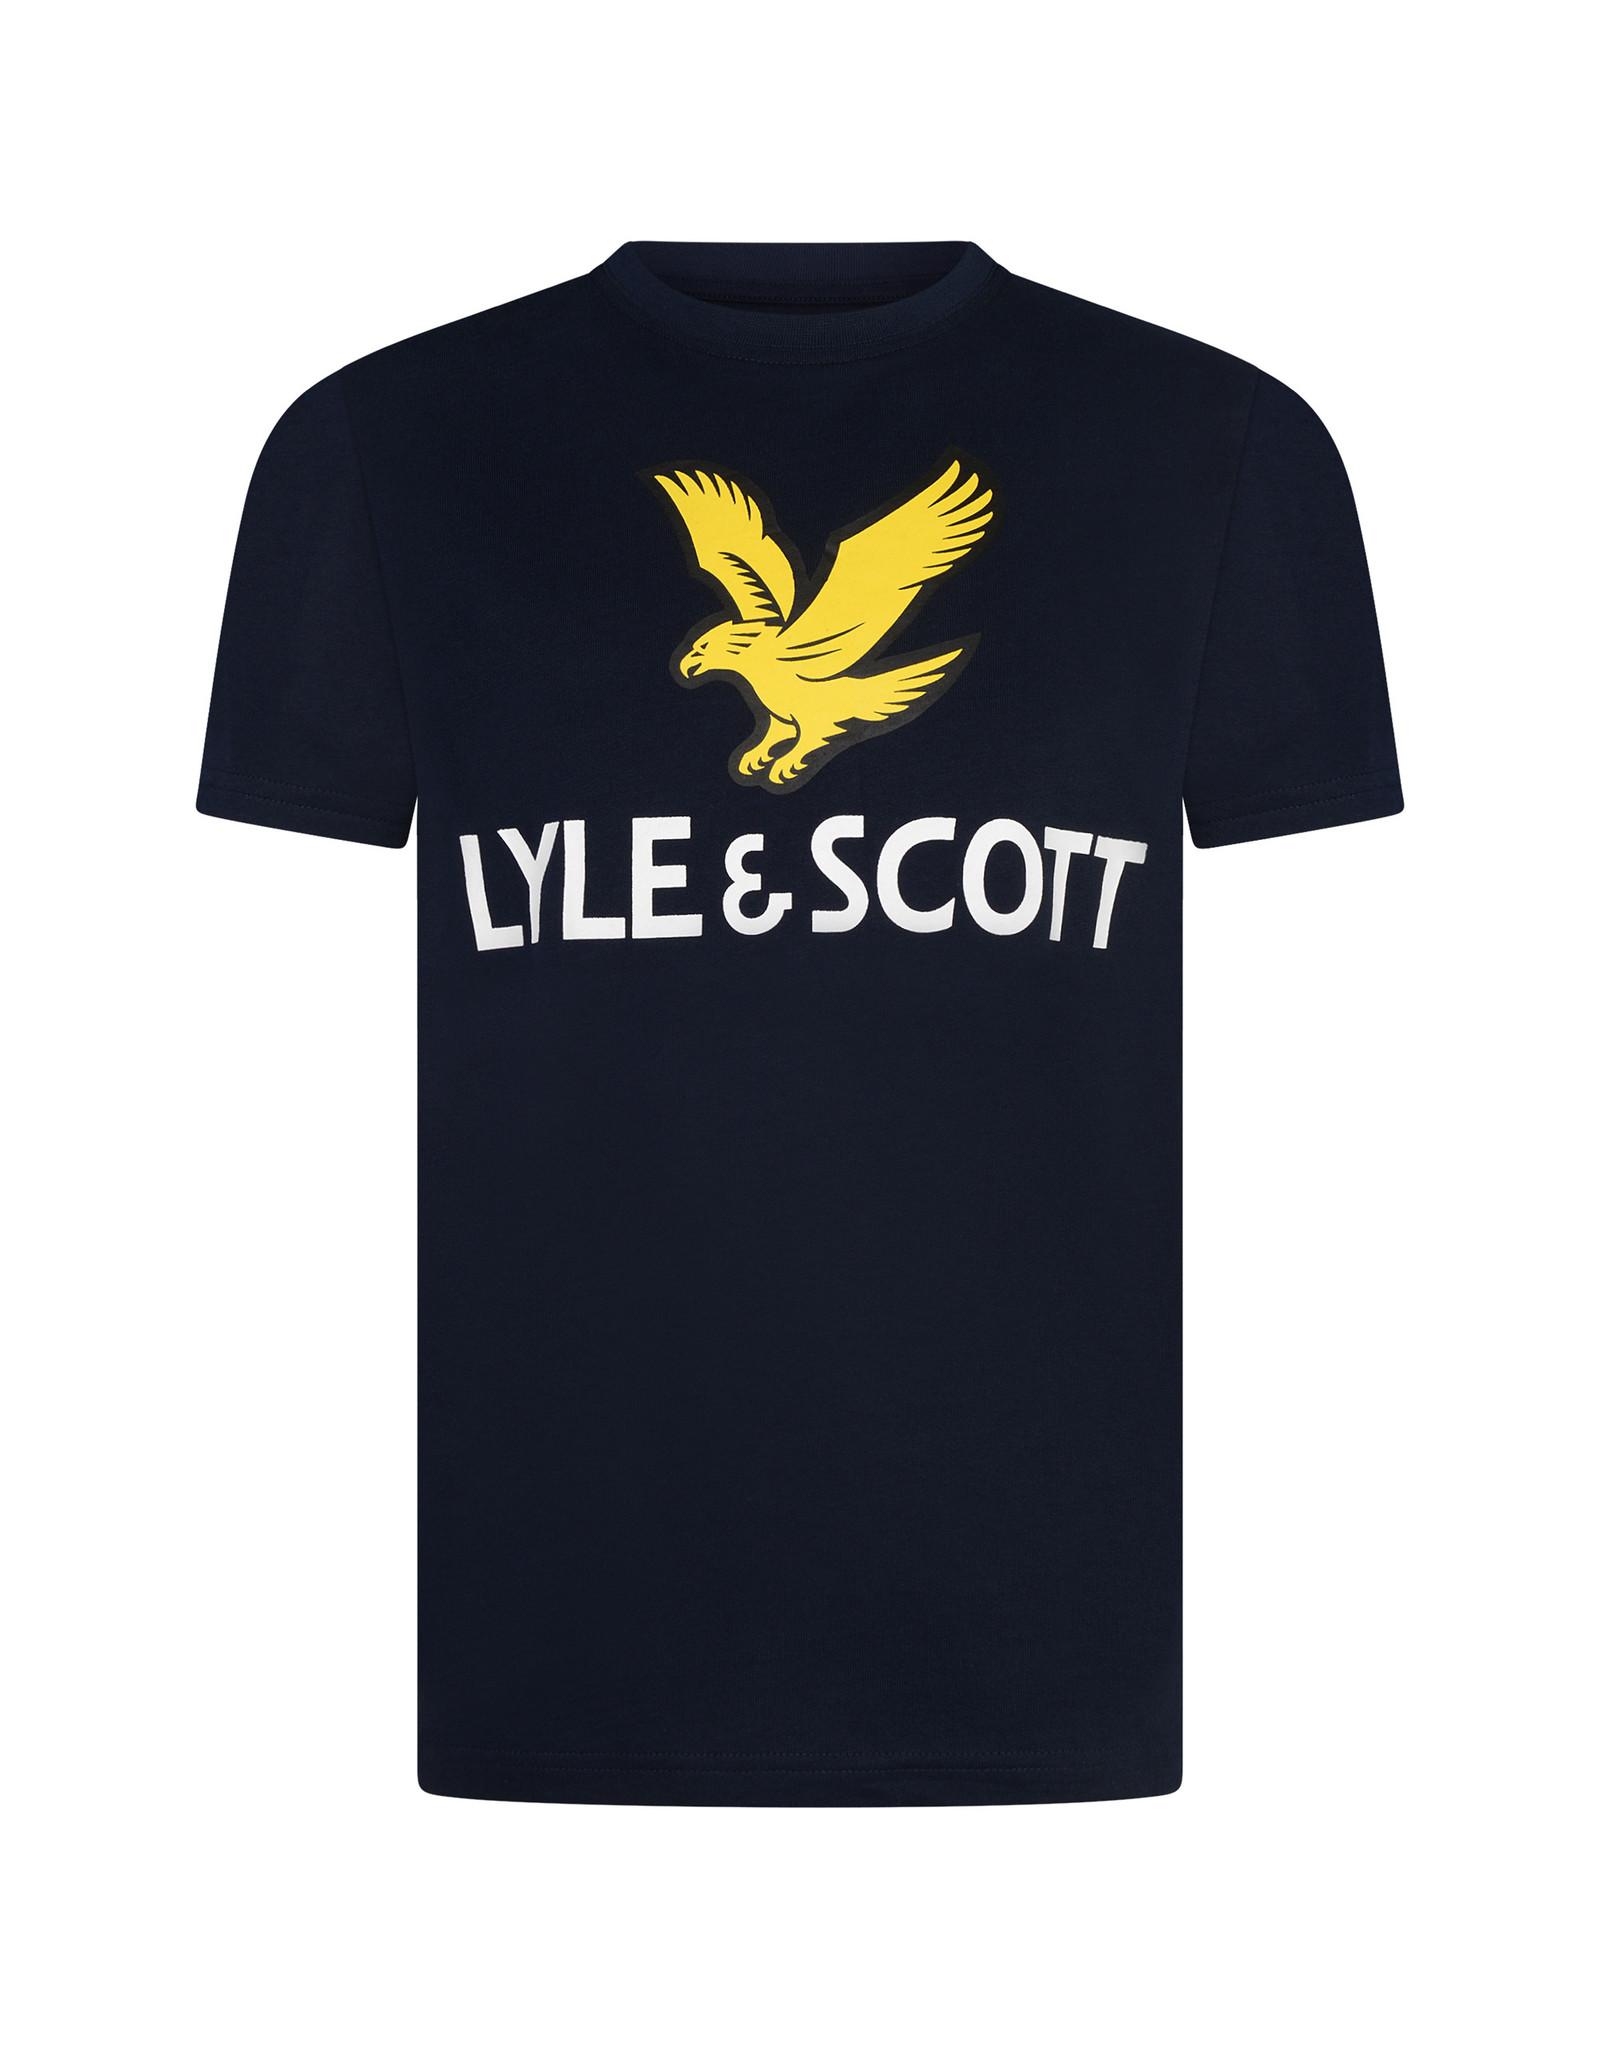 Lyle & Scott BOYS SS LYLE EAGLE LOGO T-SHIRT 203 NAVY BLAZER